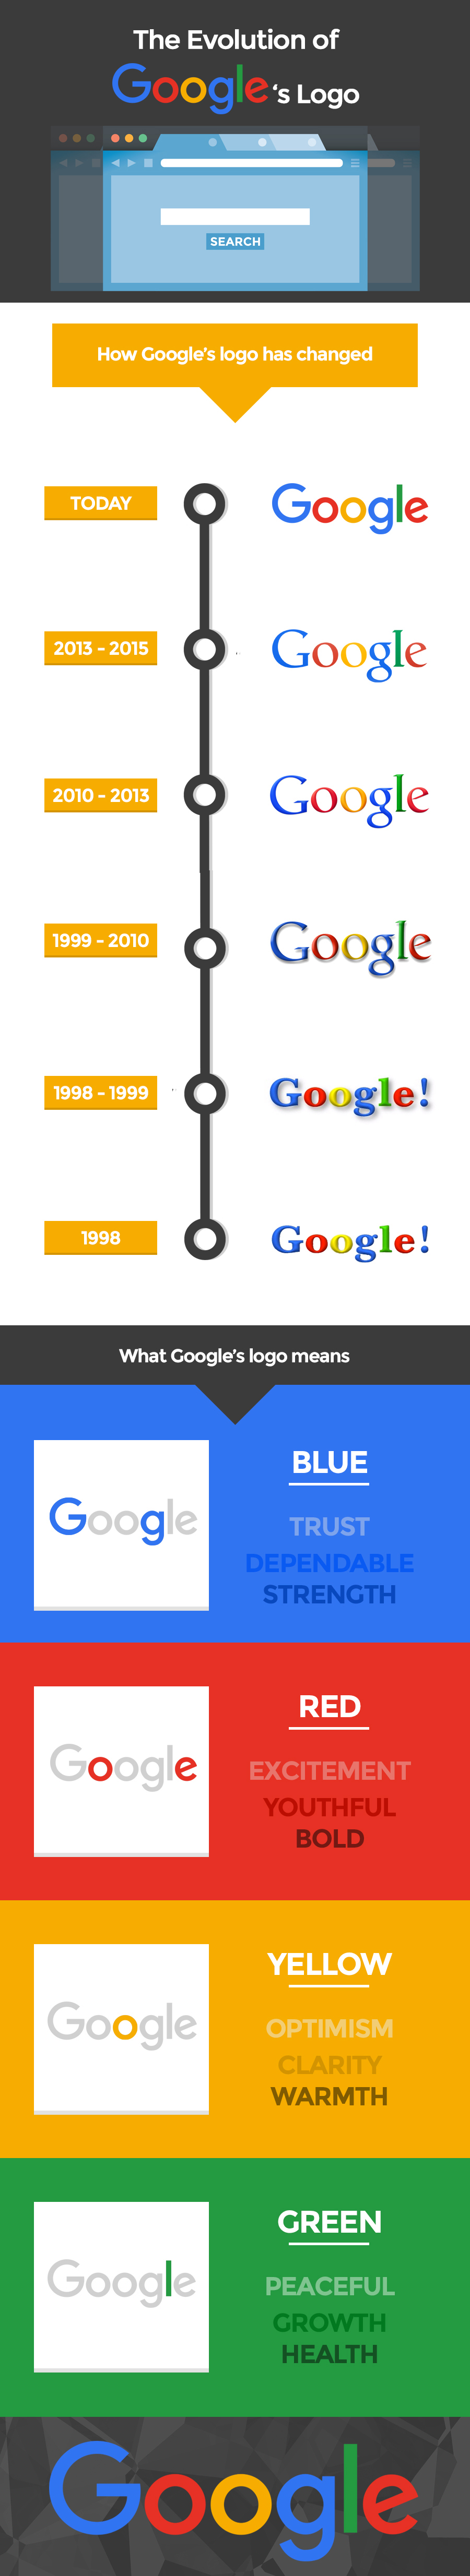 infographie-evolution-logo-google